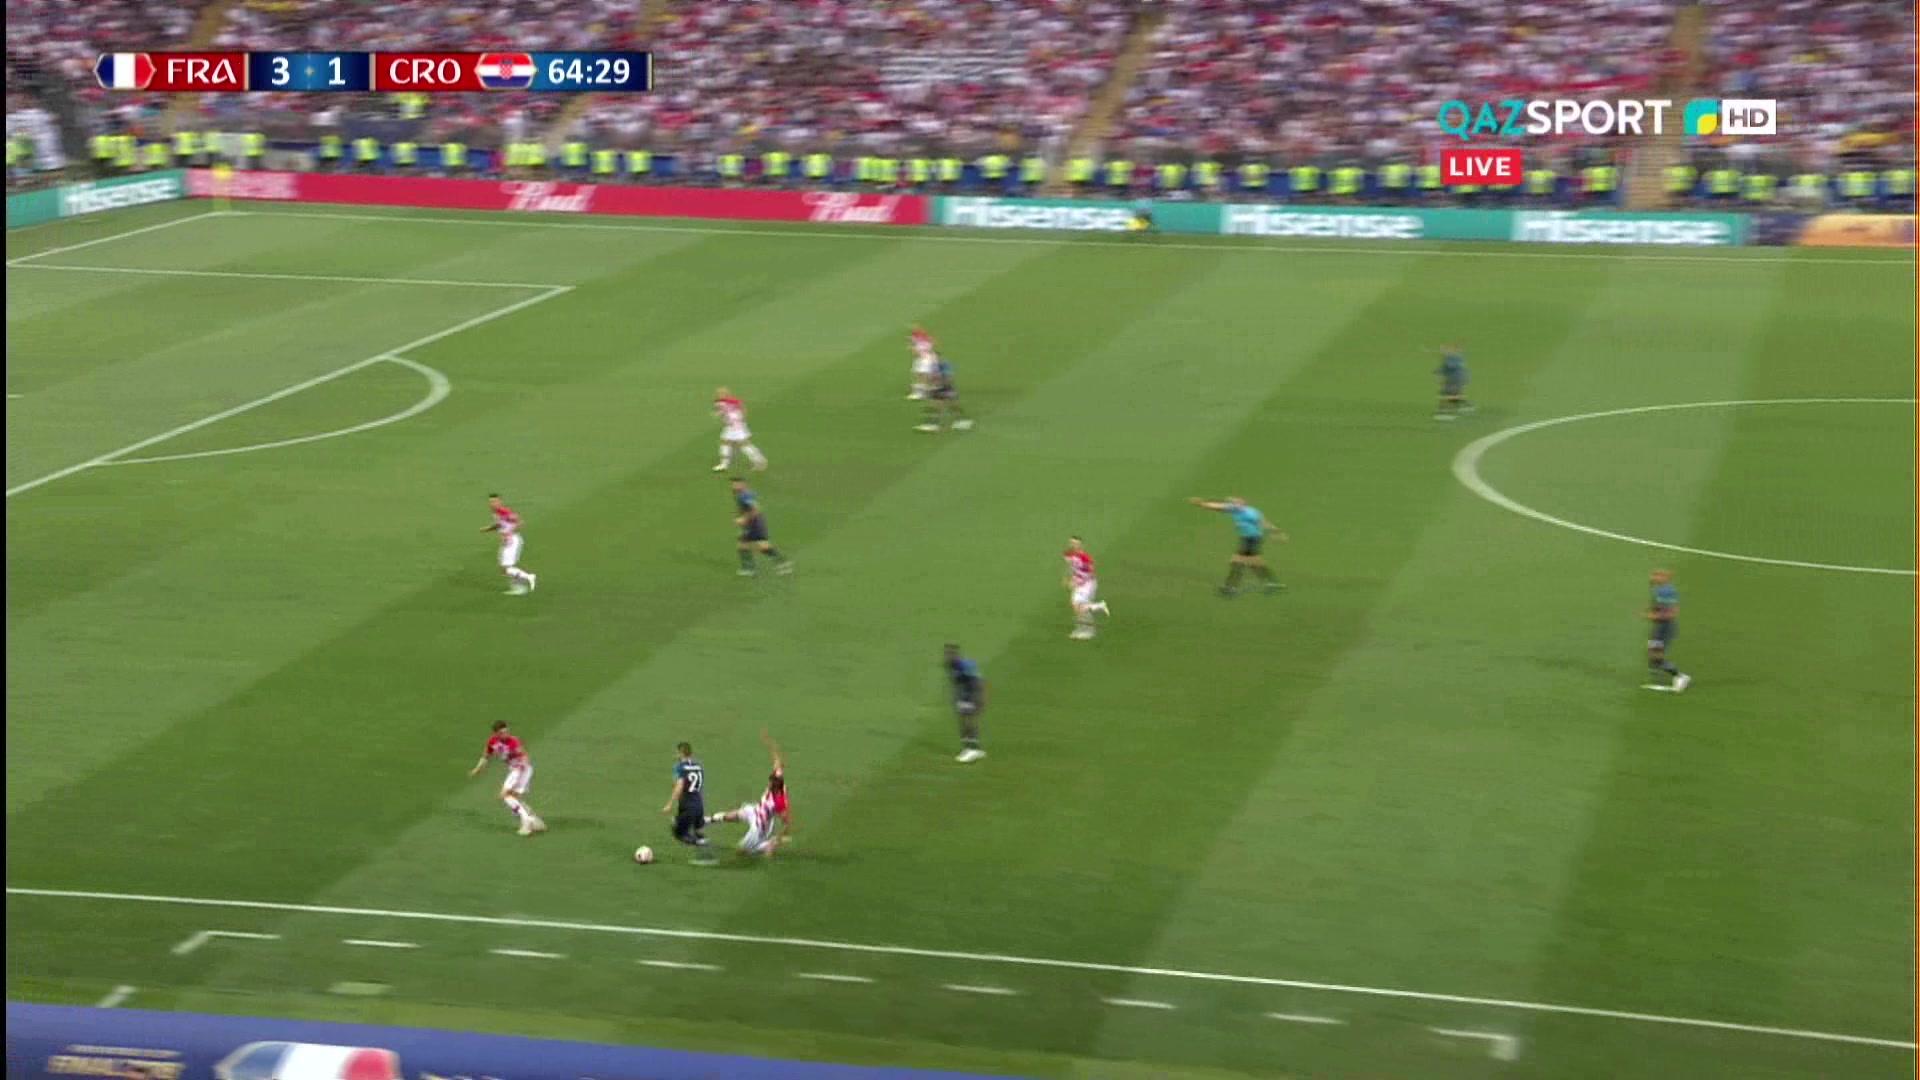 Франция 4:1 Хорватия | Гол Киллиан Мбаппе